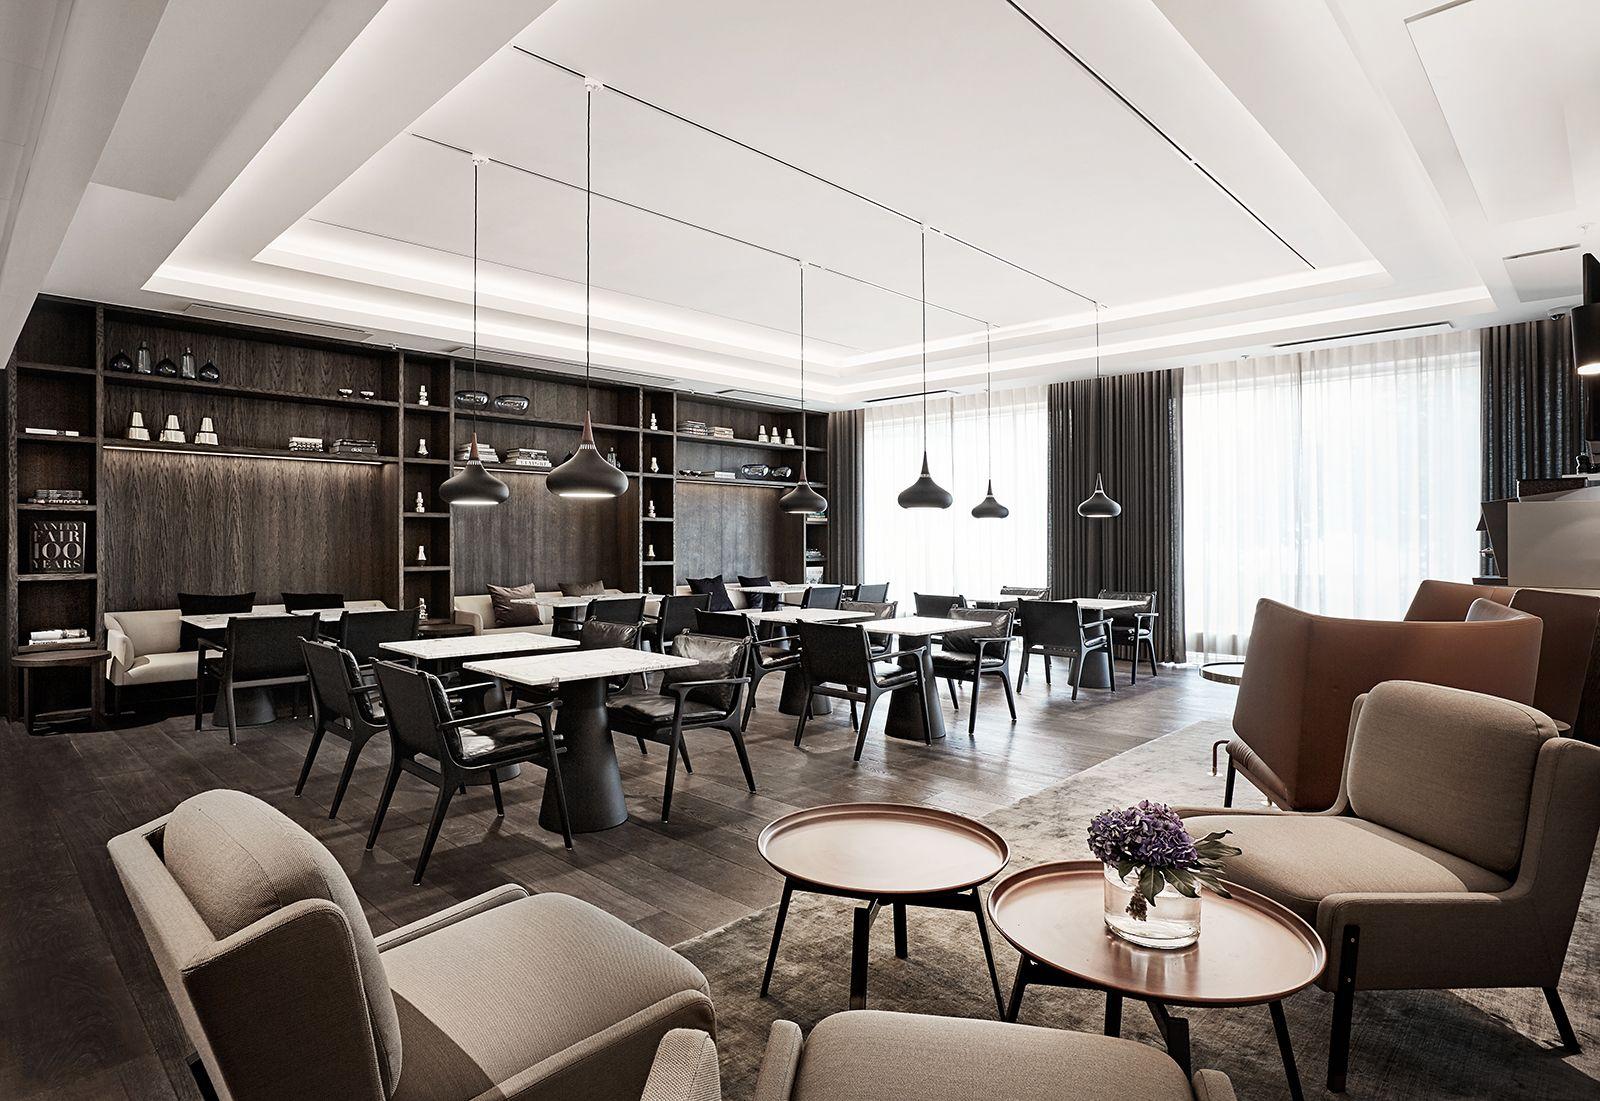 Executive Lounge Interiors